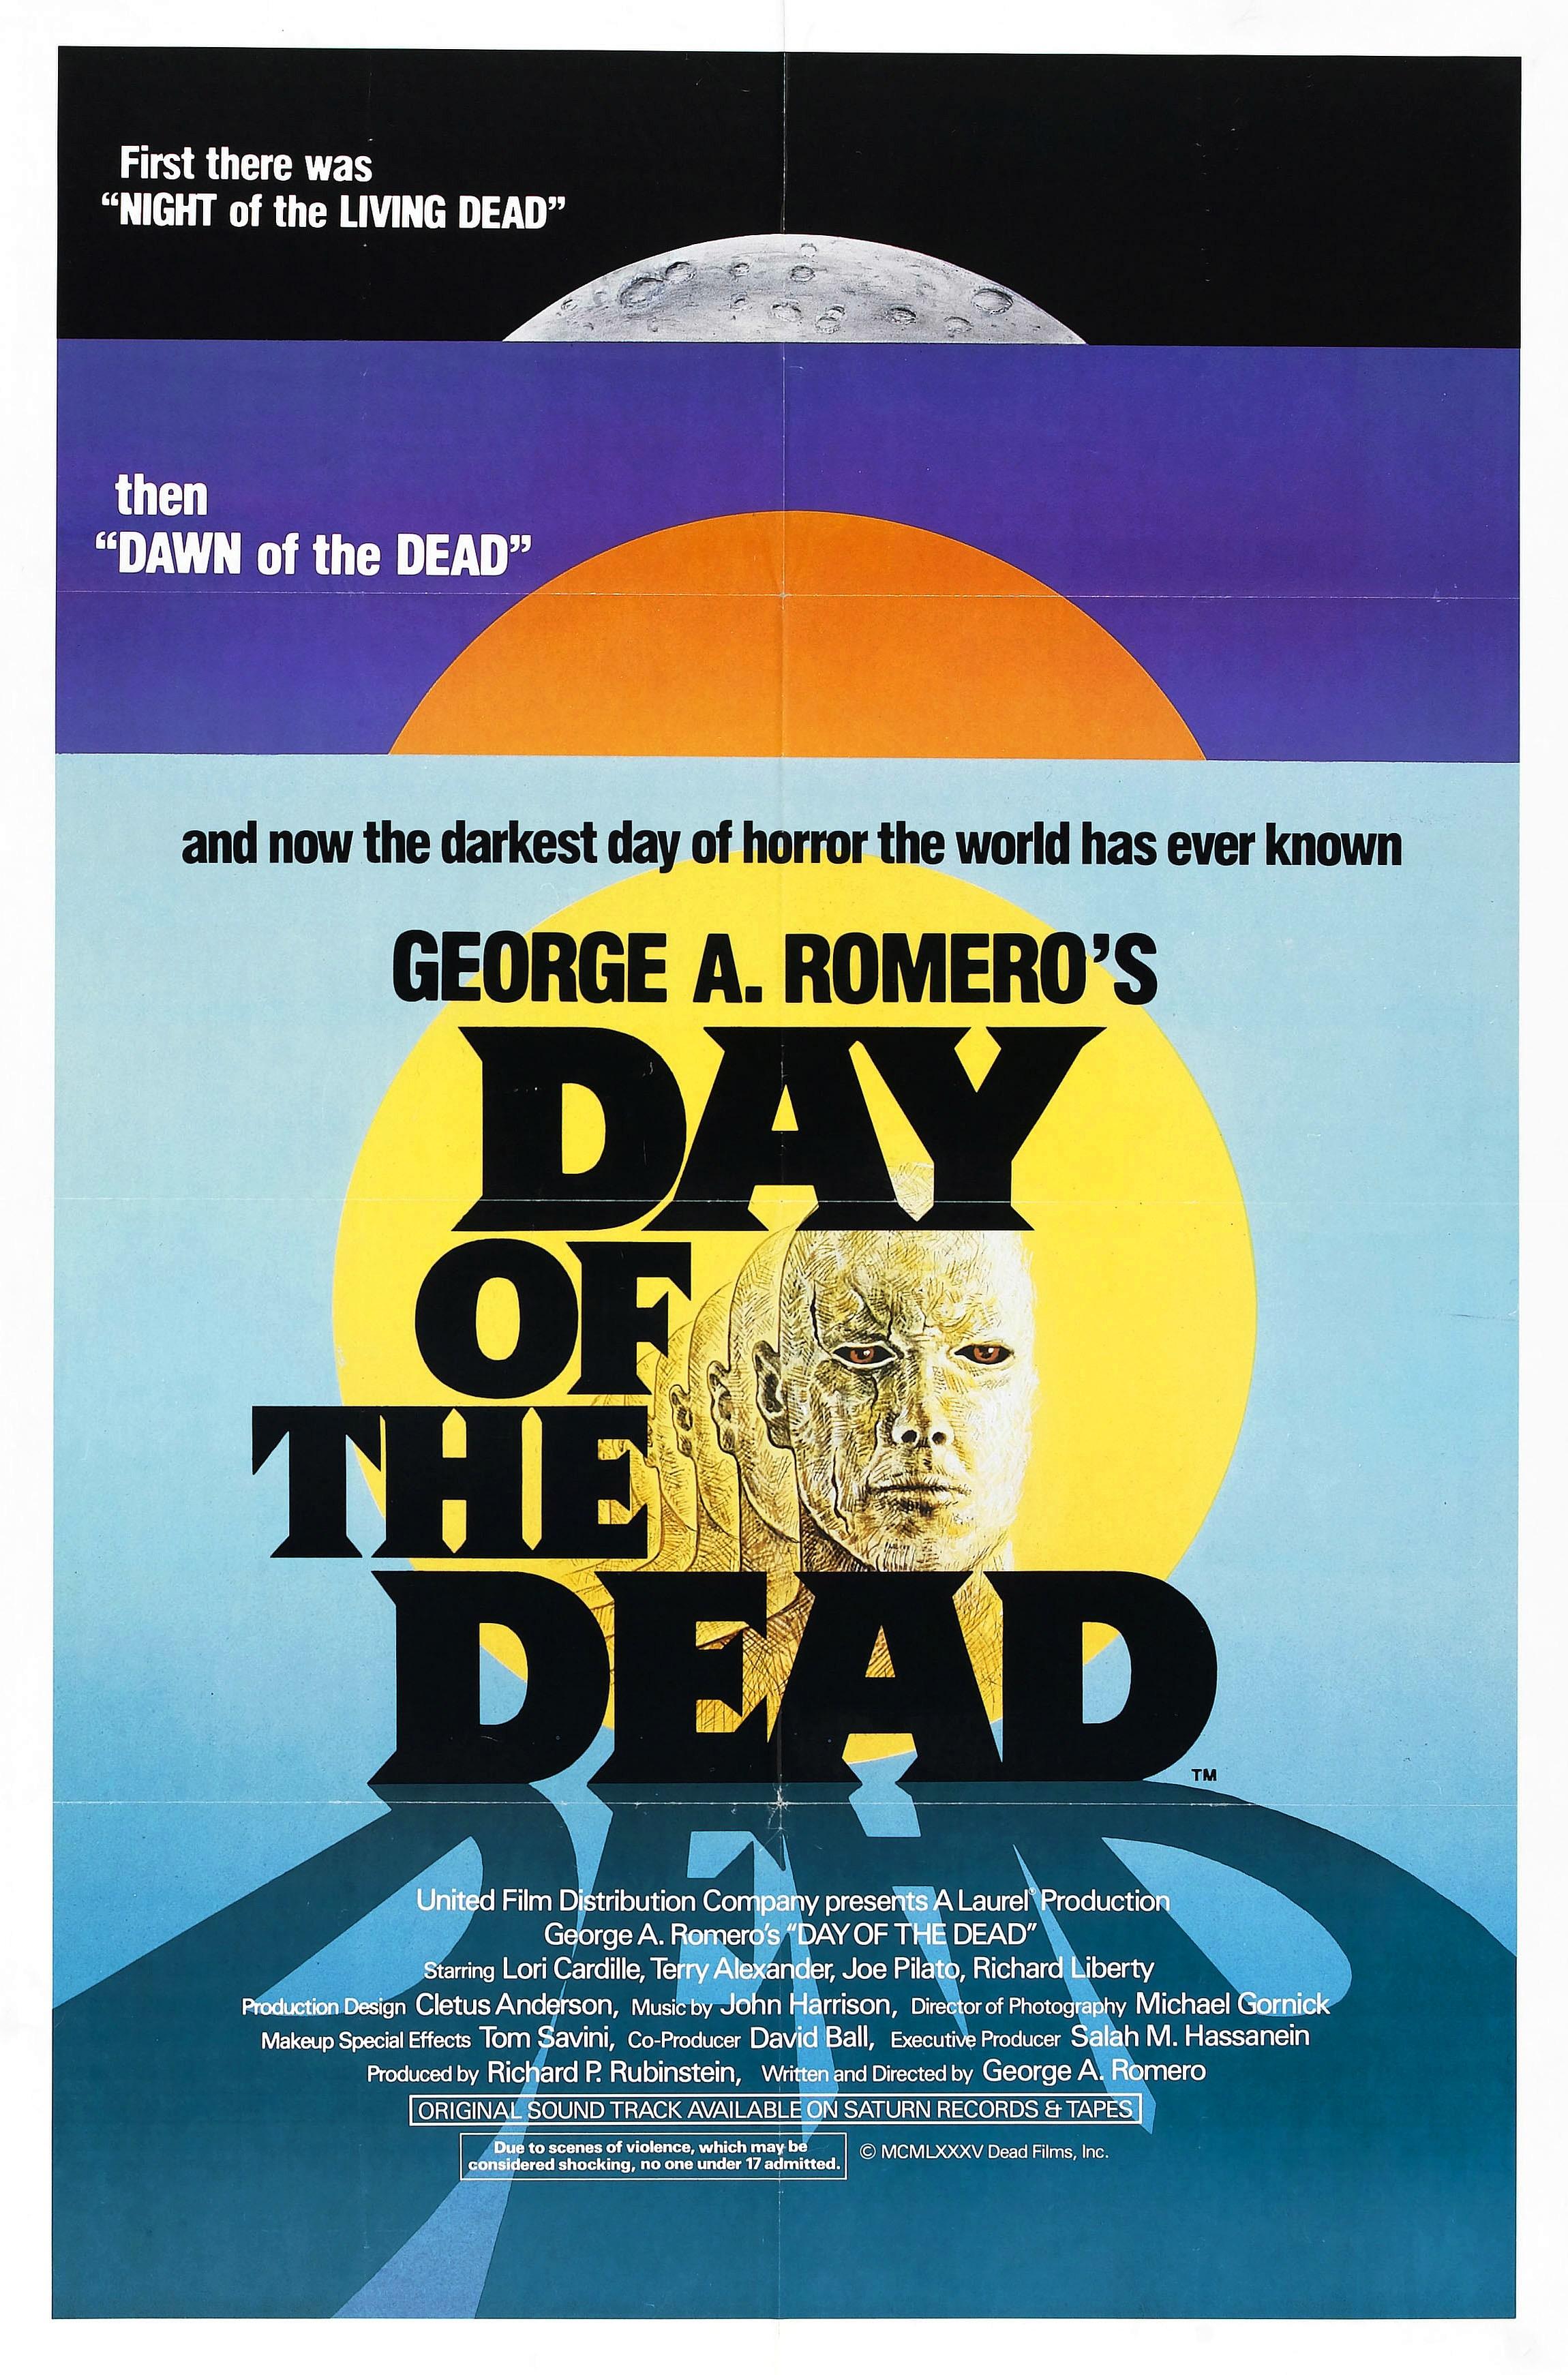 day_of_dead_poster_01.jpg